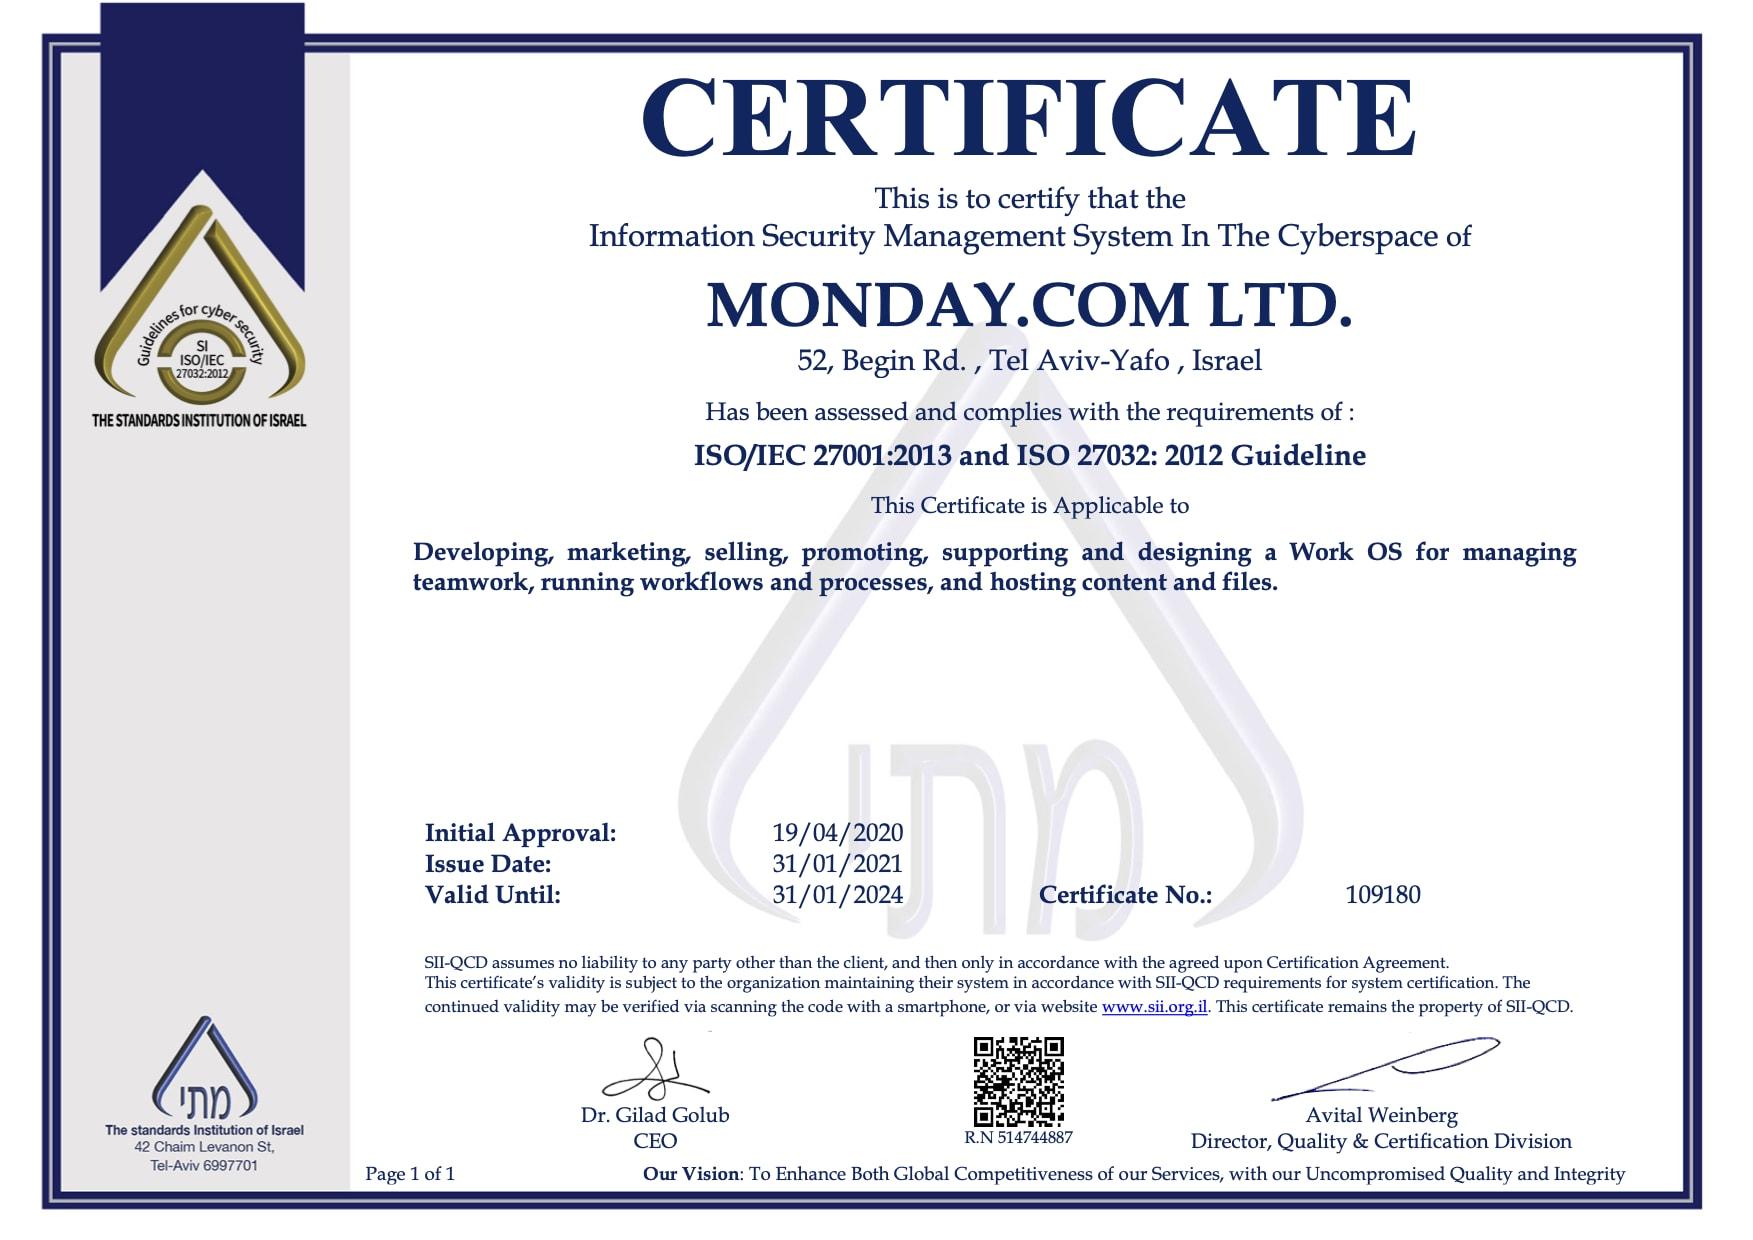 MONDAY.COM LTD. 27032